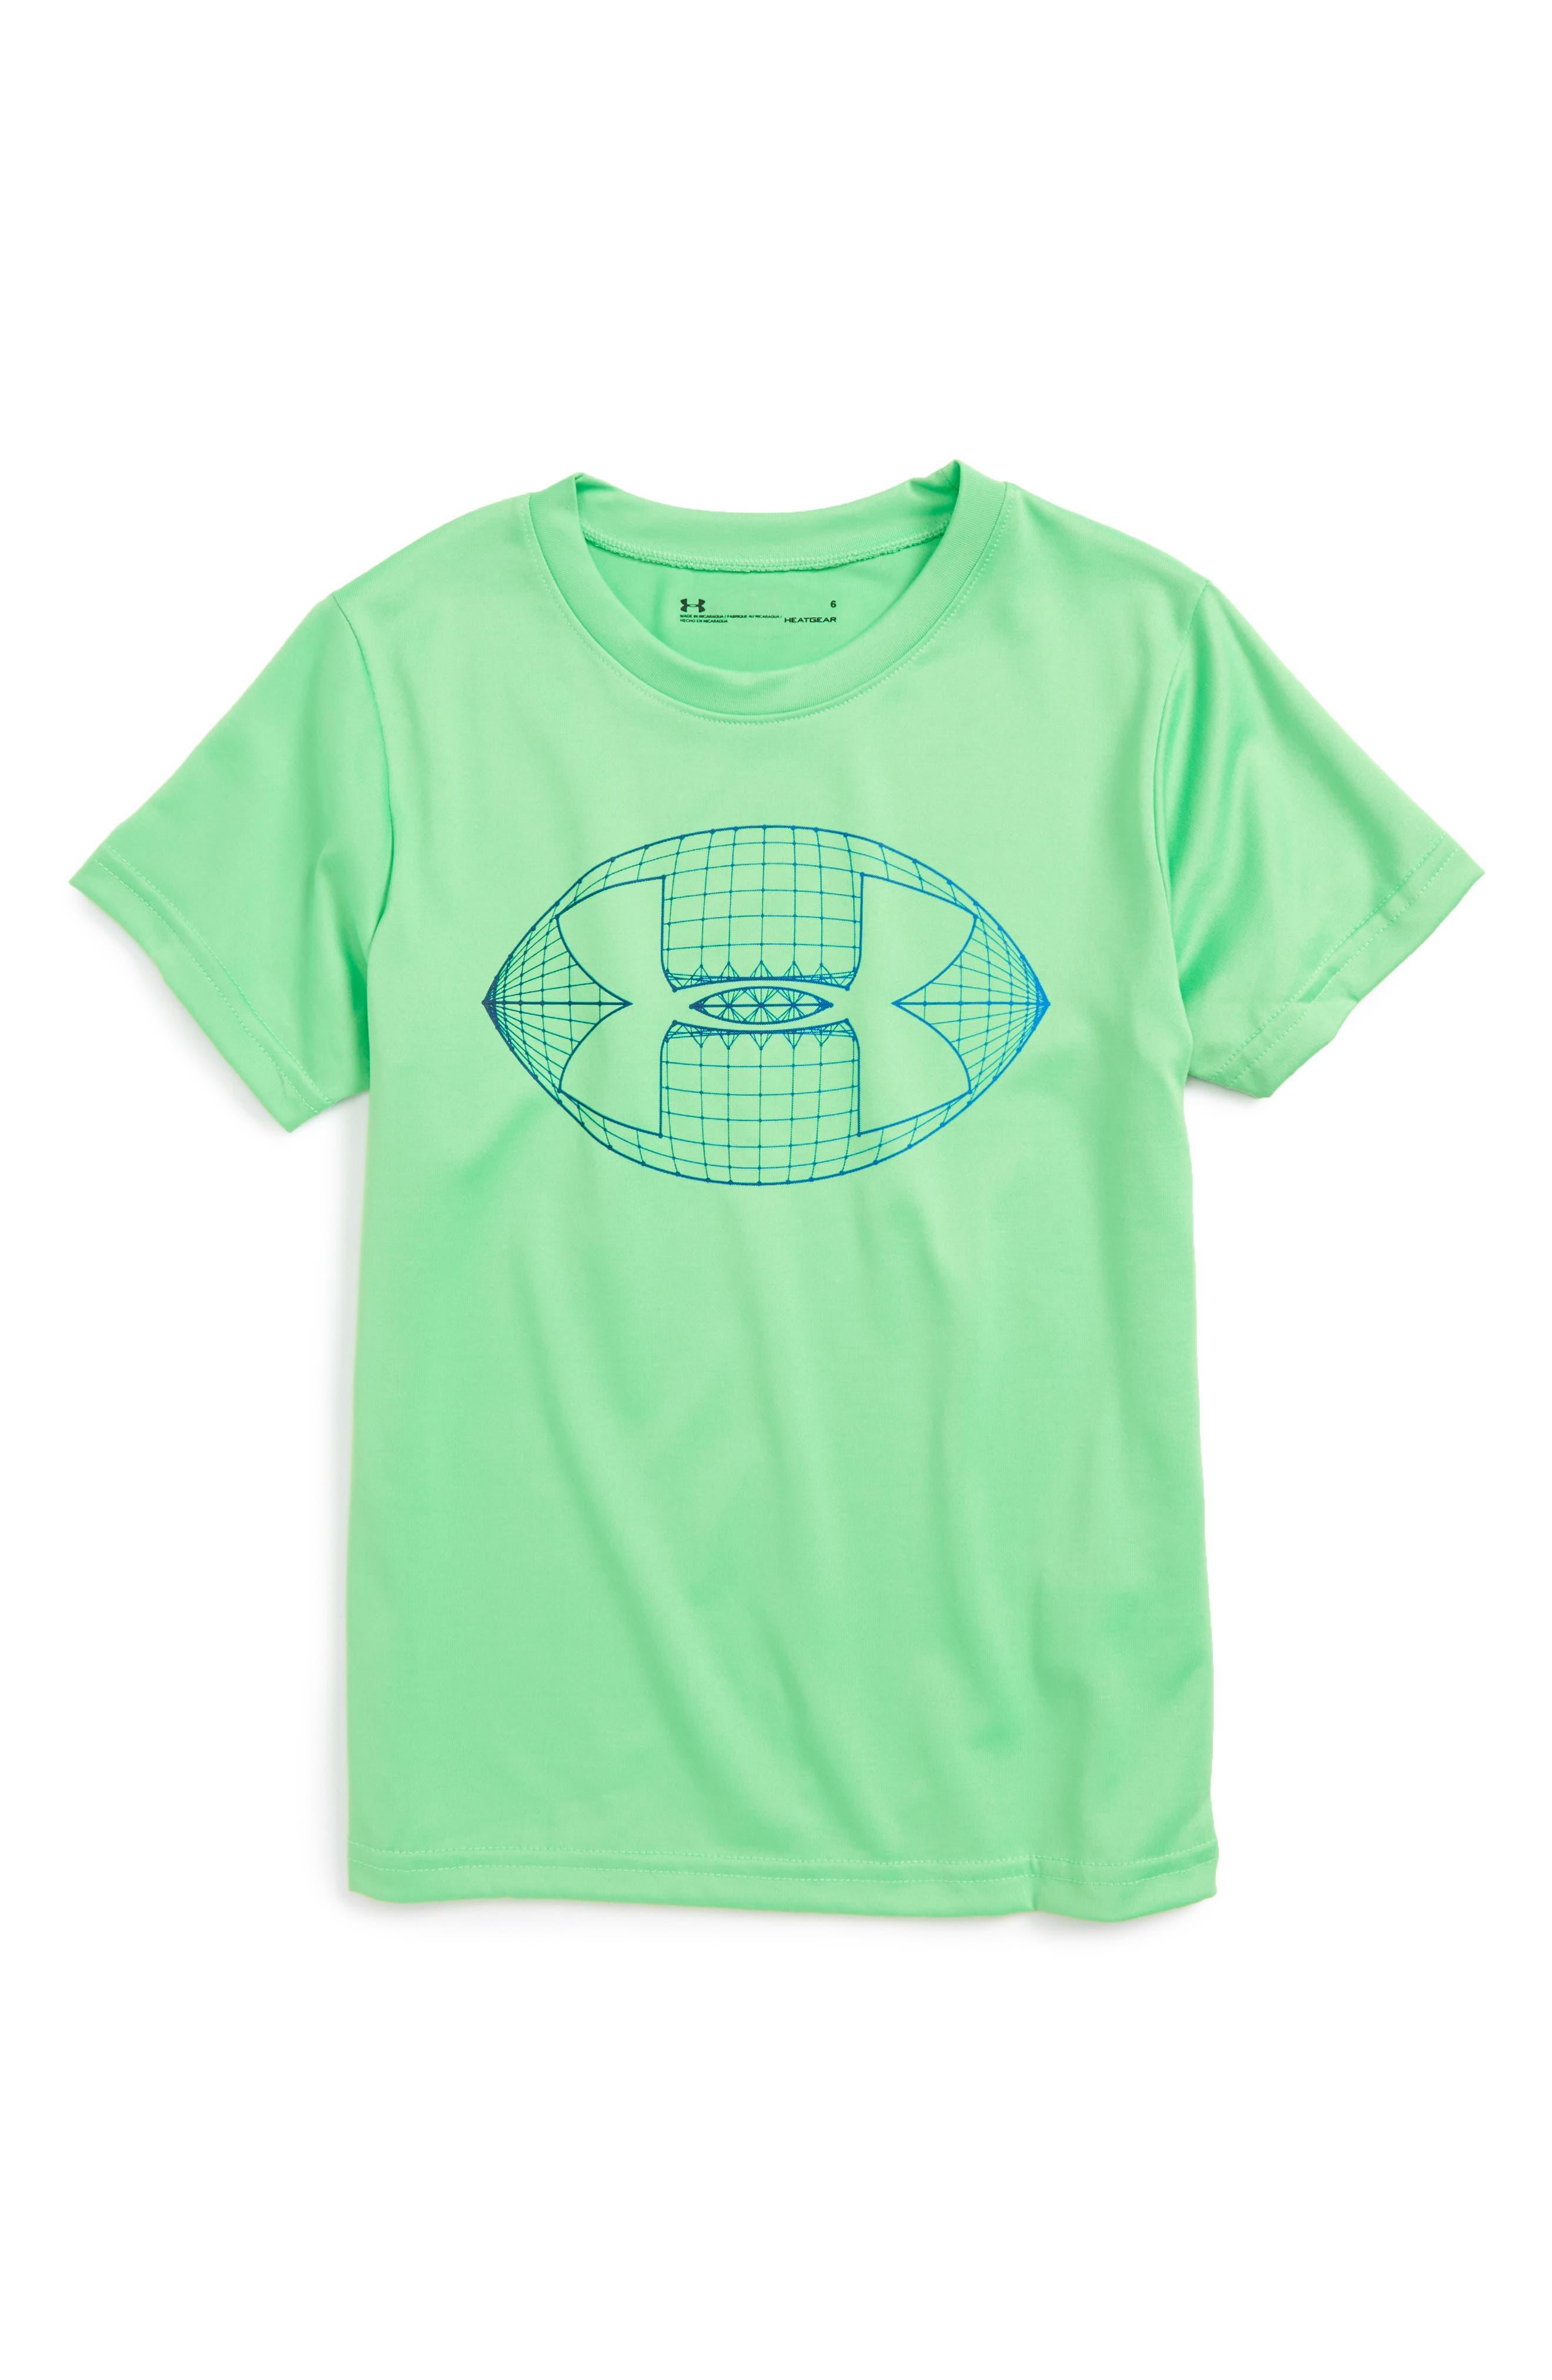 Under Armour Football Logo Graphic T-Shirt (Toddler Boys & Little Boys)